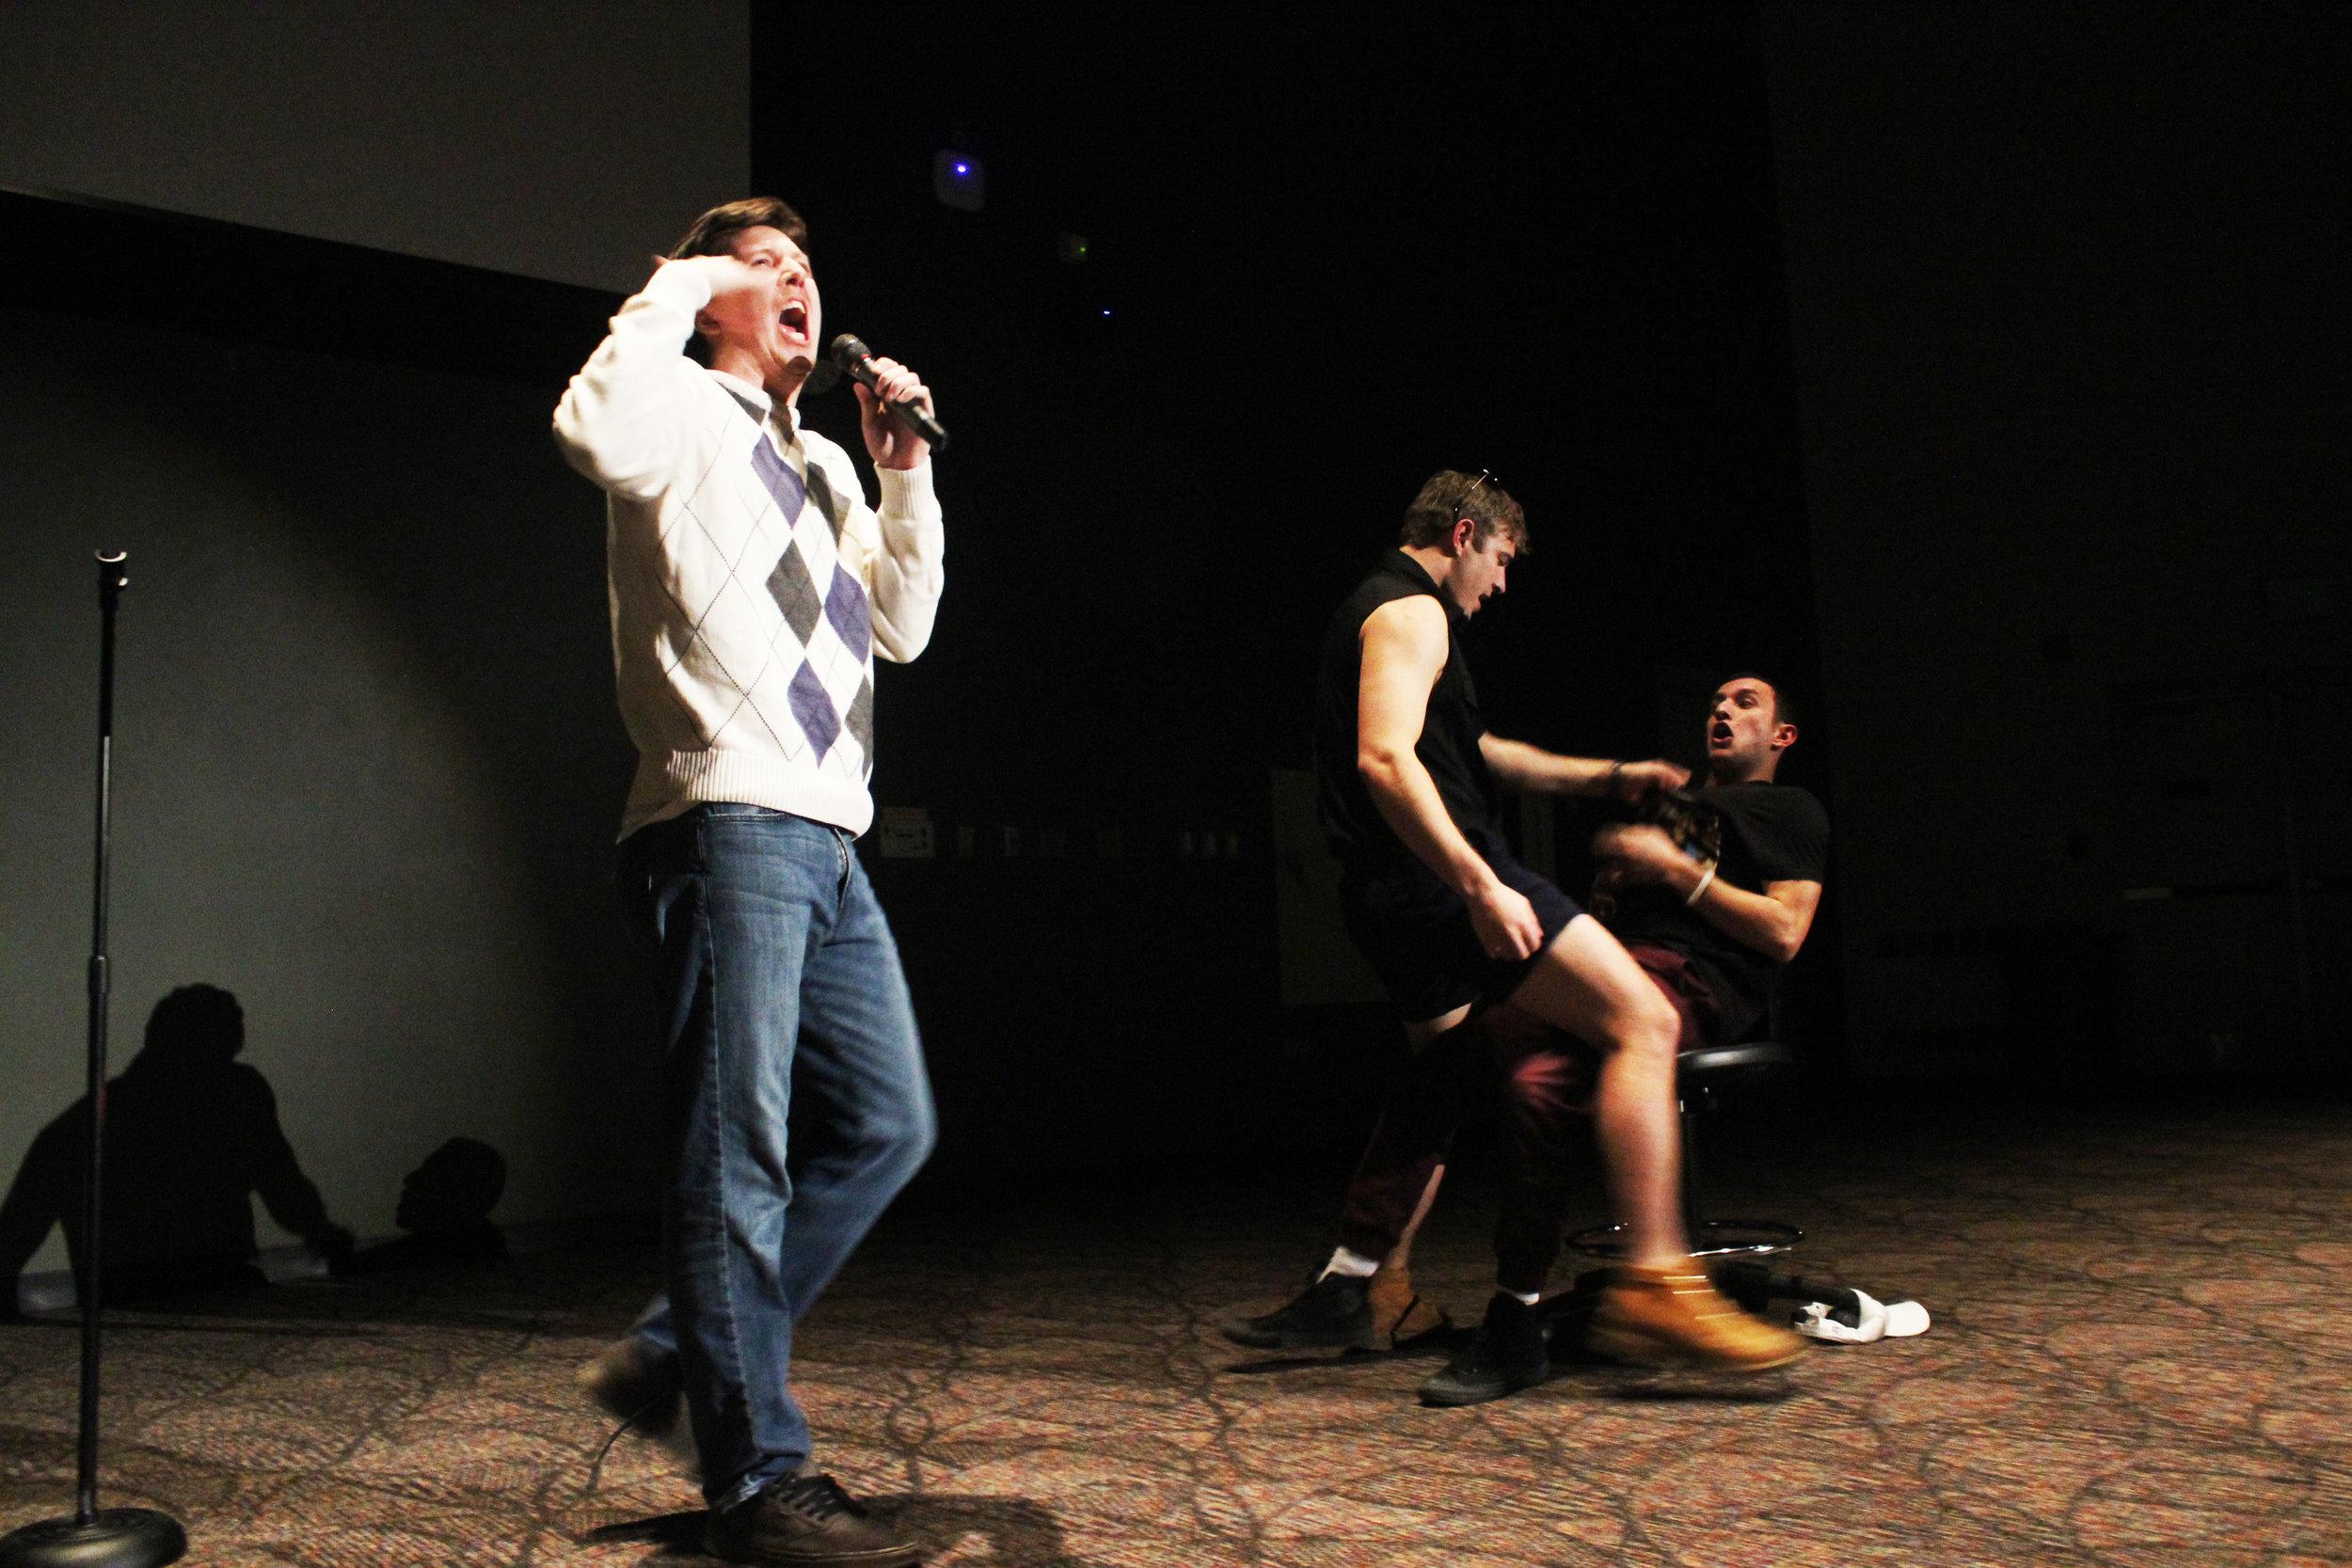 Tanner on stage.jpg